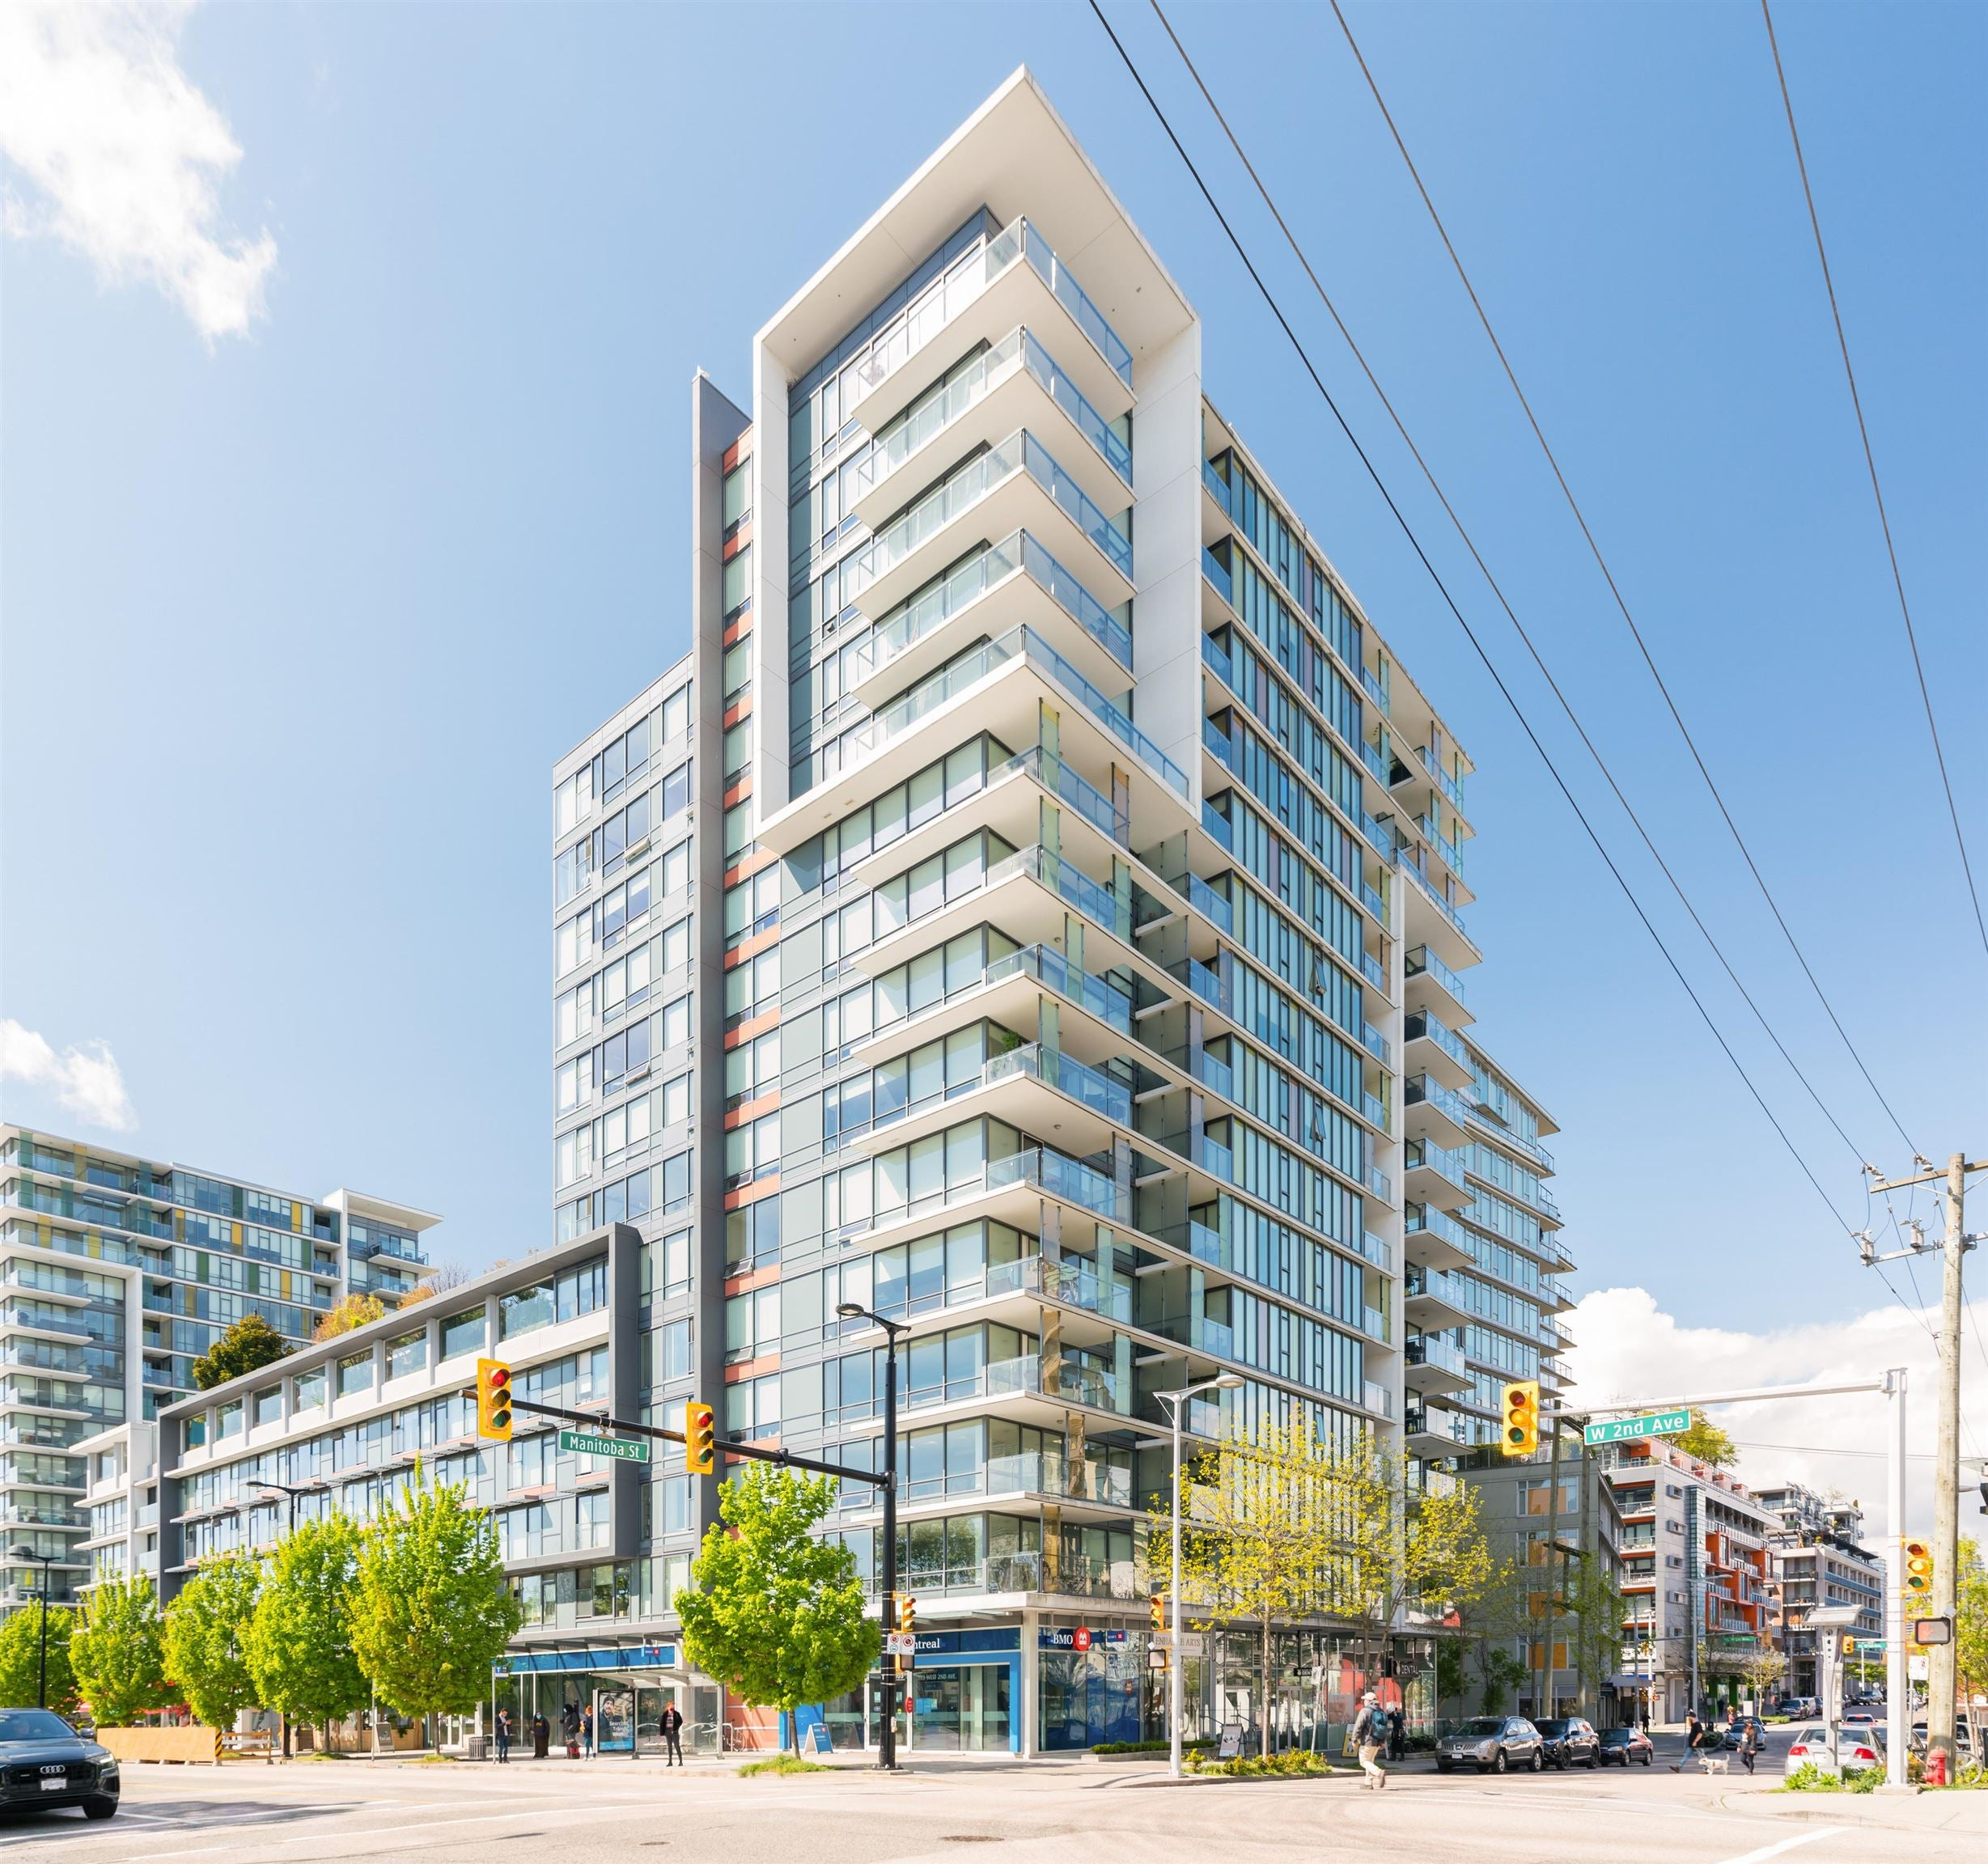 1403 1783 MANITOBA STREET - False Creek Apartment/Condo for sale, 2 Bedrooms (R2623839) - #1